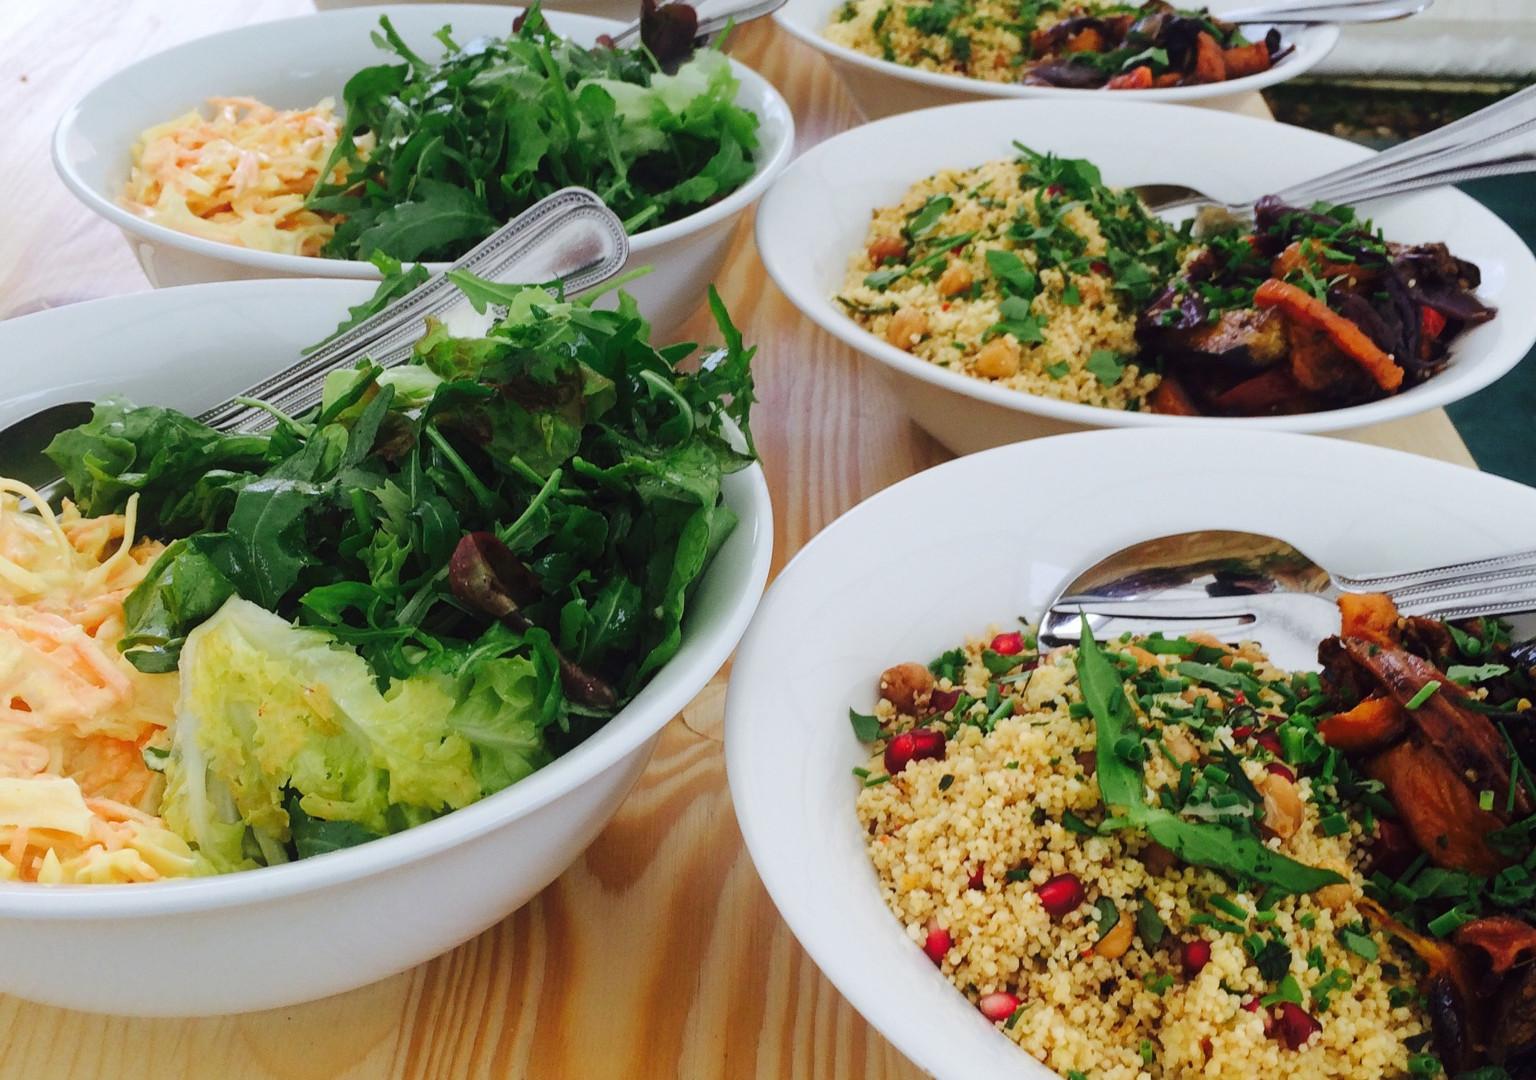 Talton Lodge salads ready to eat